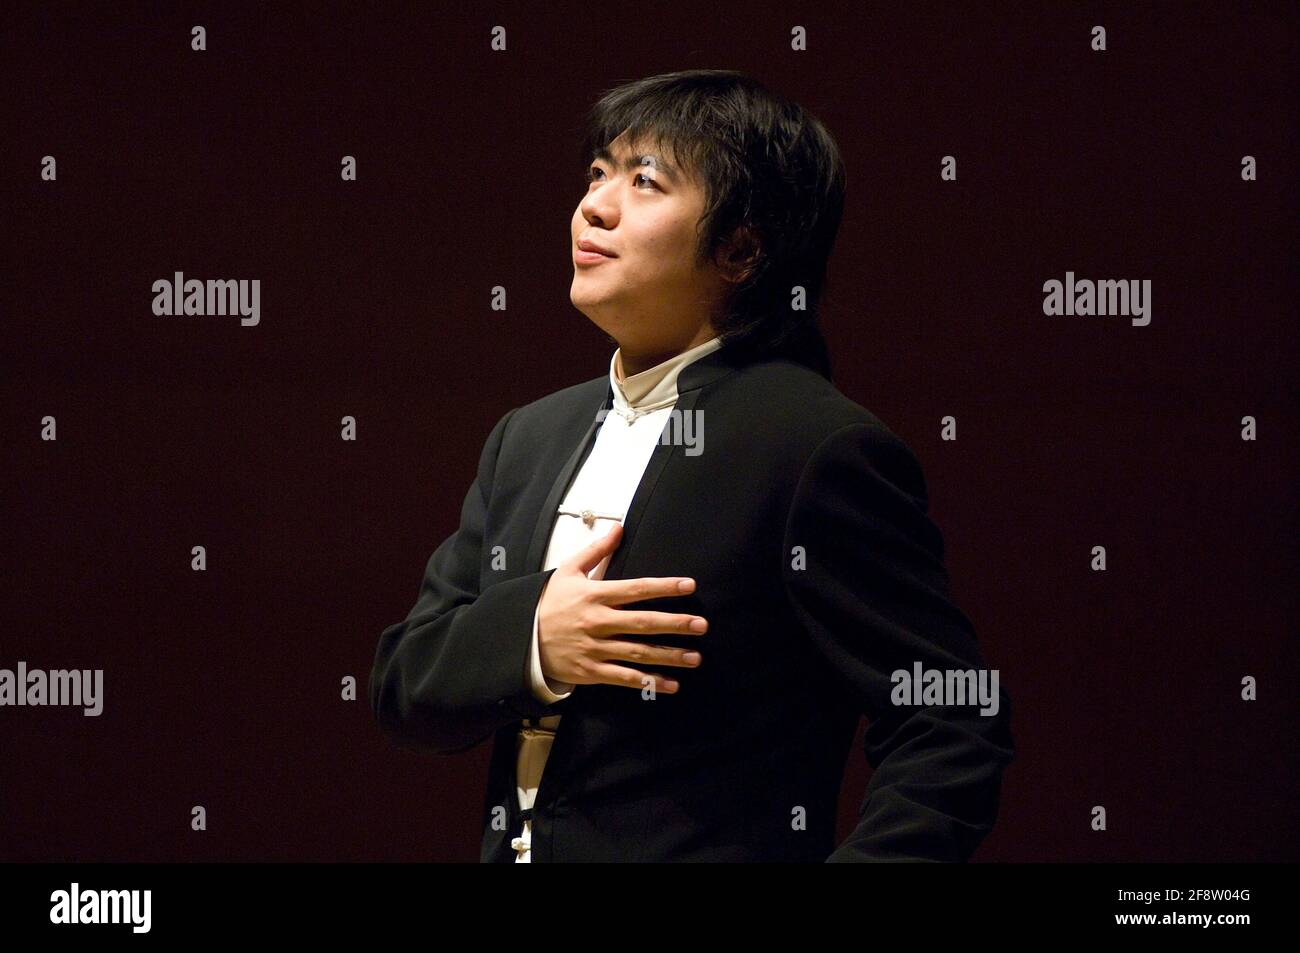 DEU, Deutschland, Ruhrgebiet, Essen, 10.02.2006: Der Pianista Lang Lang nimmt die Ovationen des Publikums entgegen bei seinem Konzert in der Philharmon Foto de stock